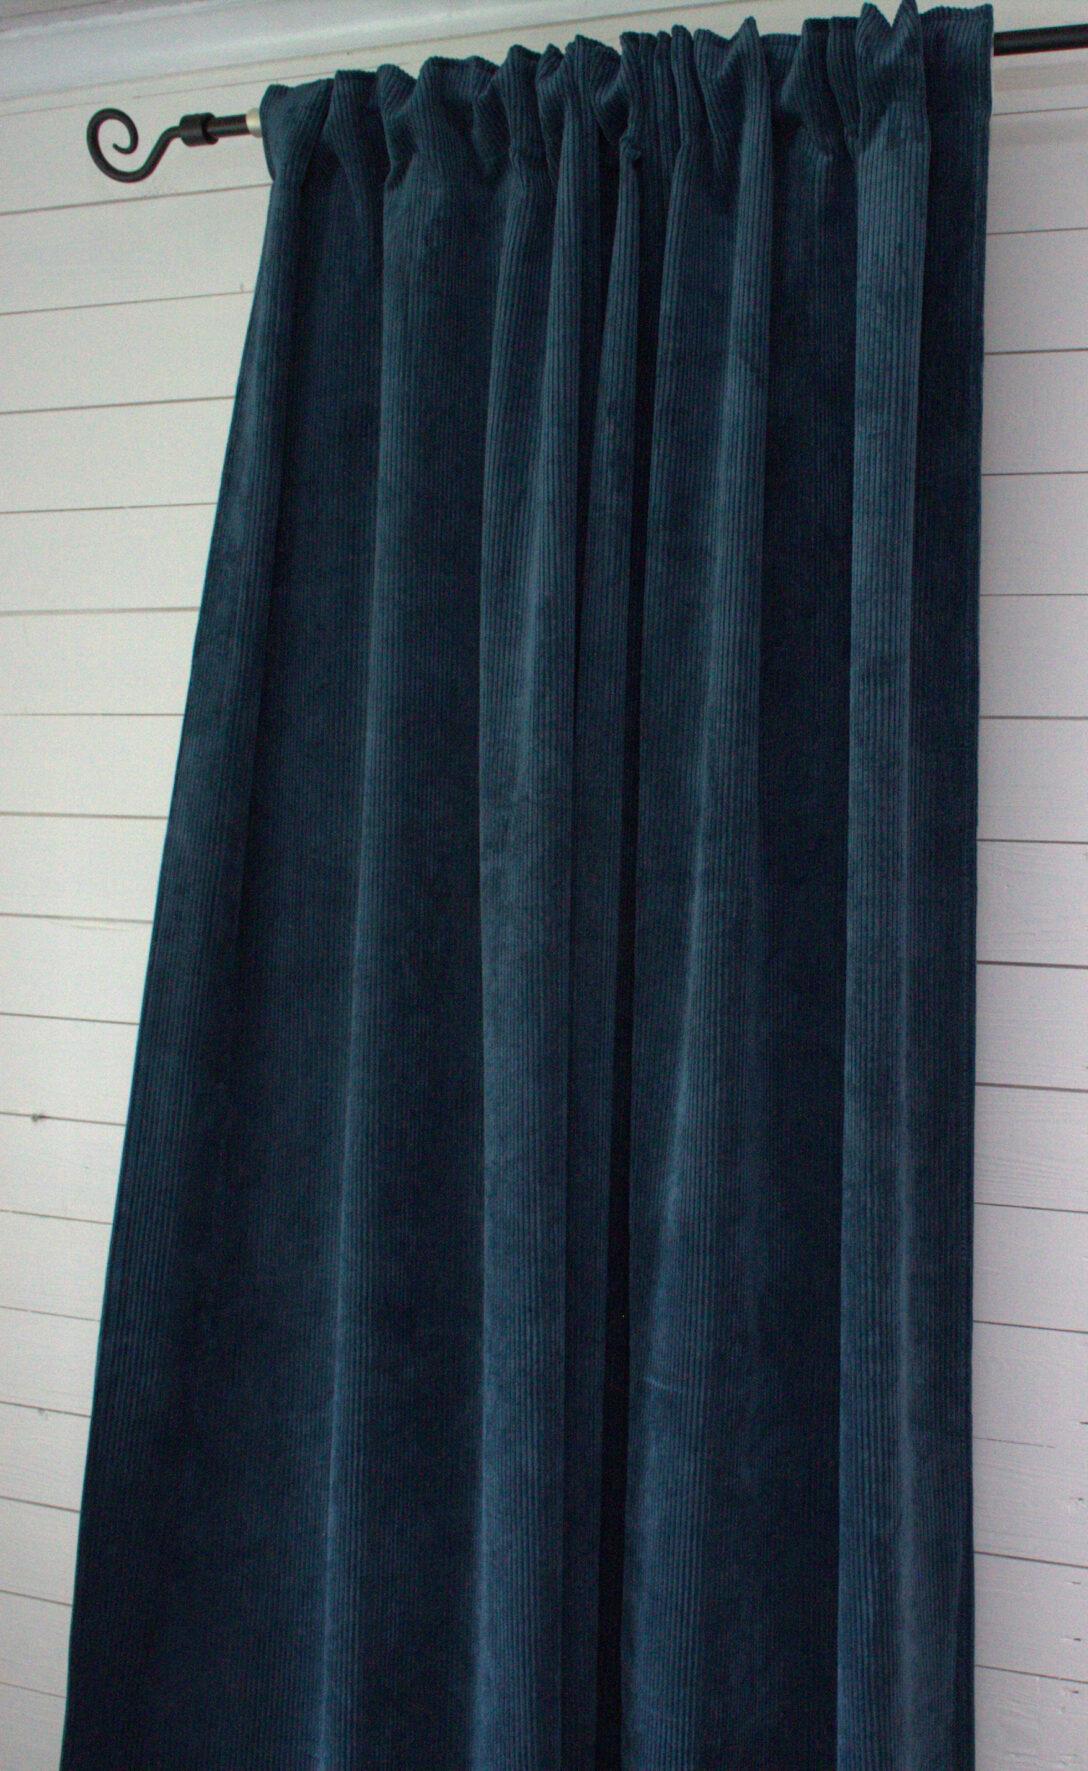 Large Size of Vorhang Suna Samt Kord Petrol 140x250 Cm 2 Stck Blickdicht Scheibengardinen Küche Wohnzimmer Scheibengardinen Blickdicht